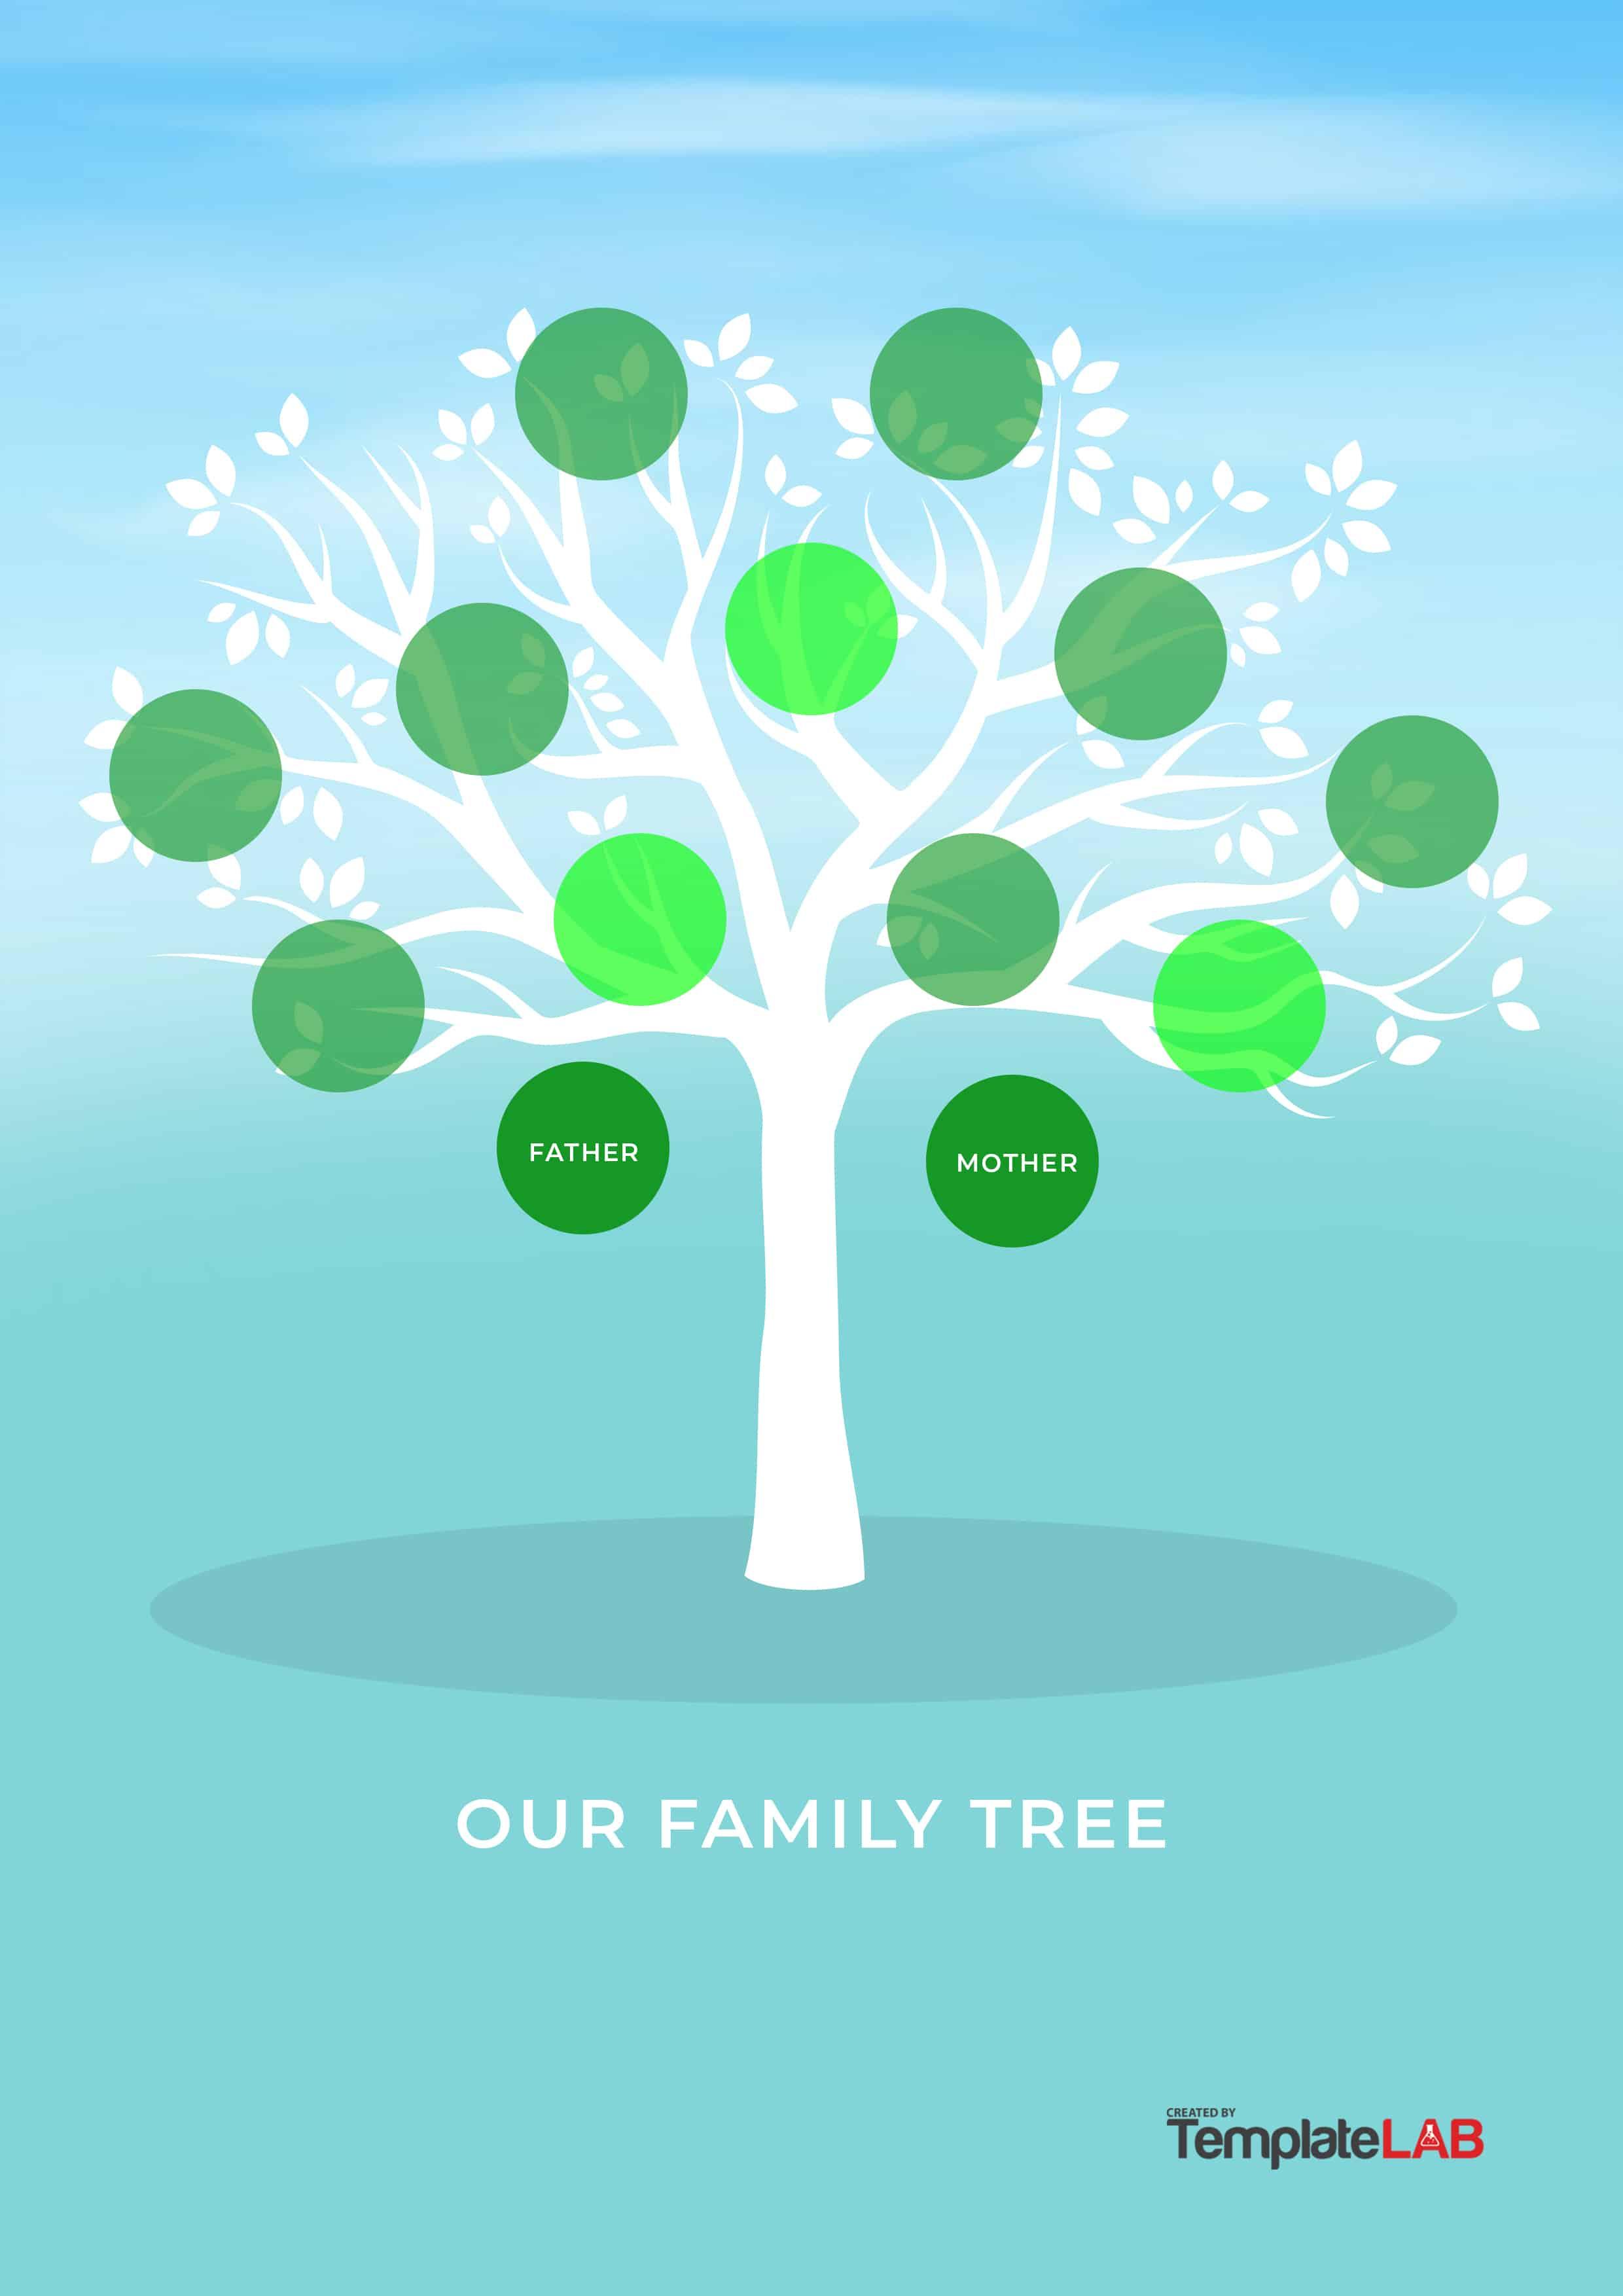 50+ Free Family Tree Templates (Word, Excel, Pdf) - Template Lab - Free Printable Family Tree